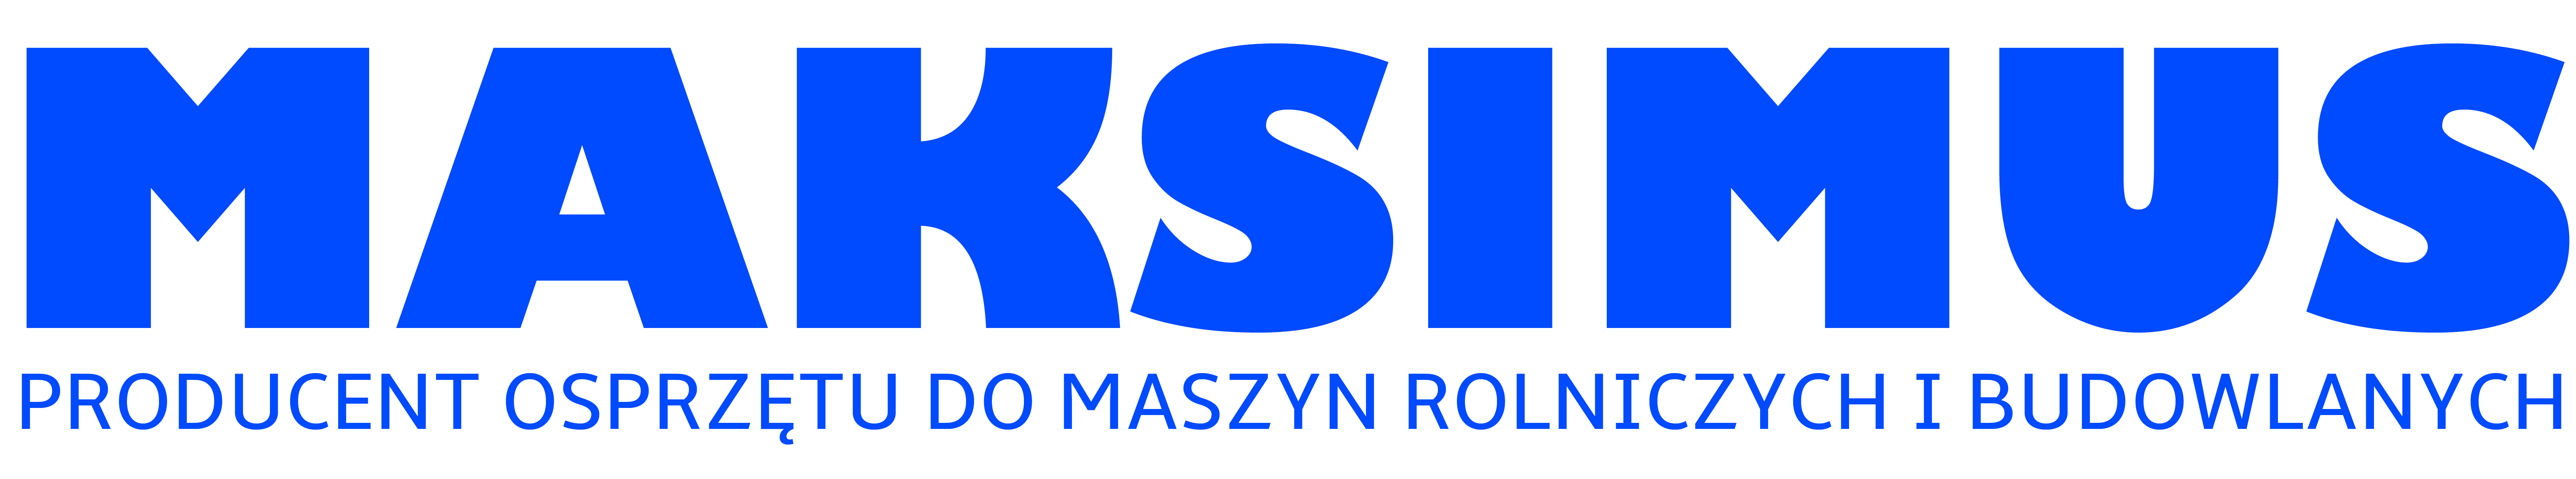 Maksimus